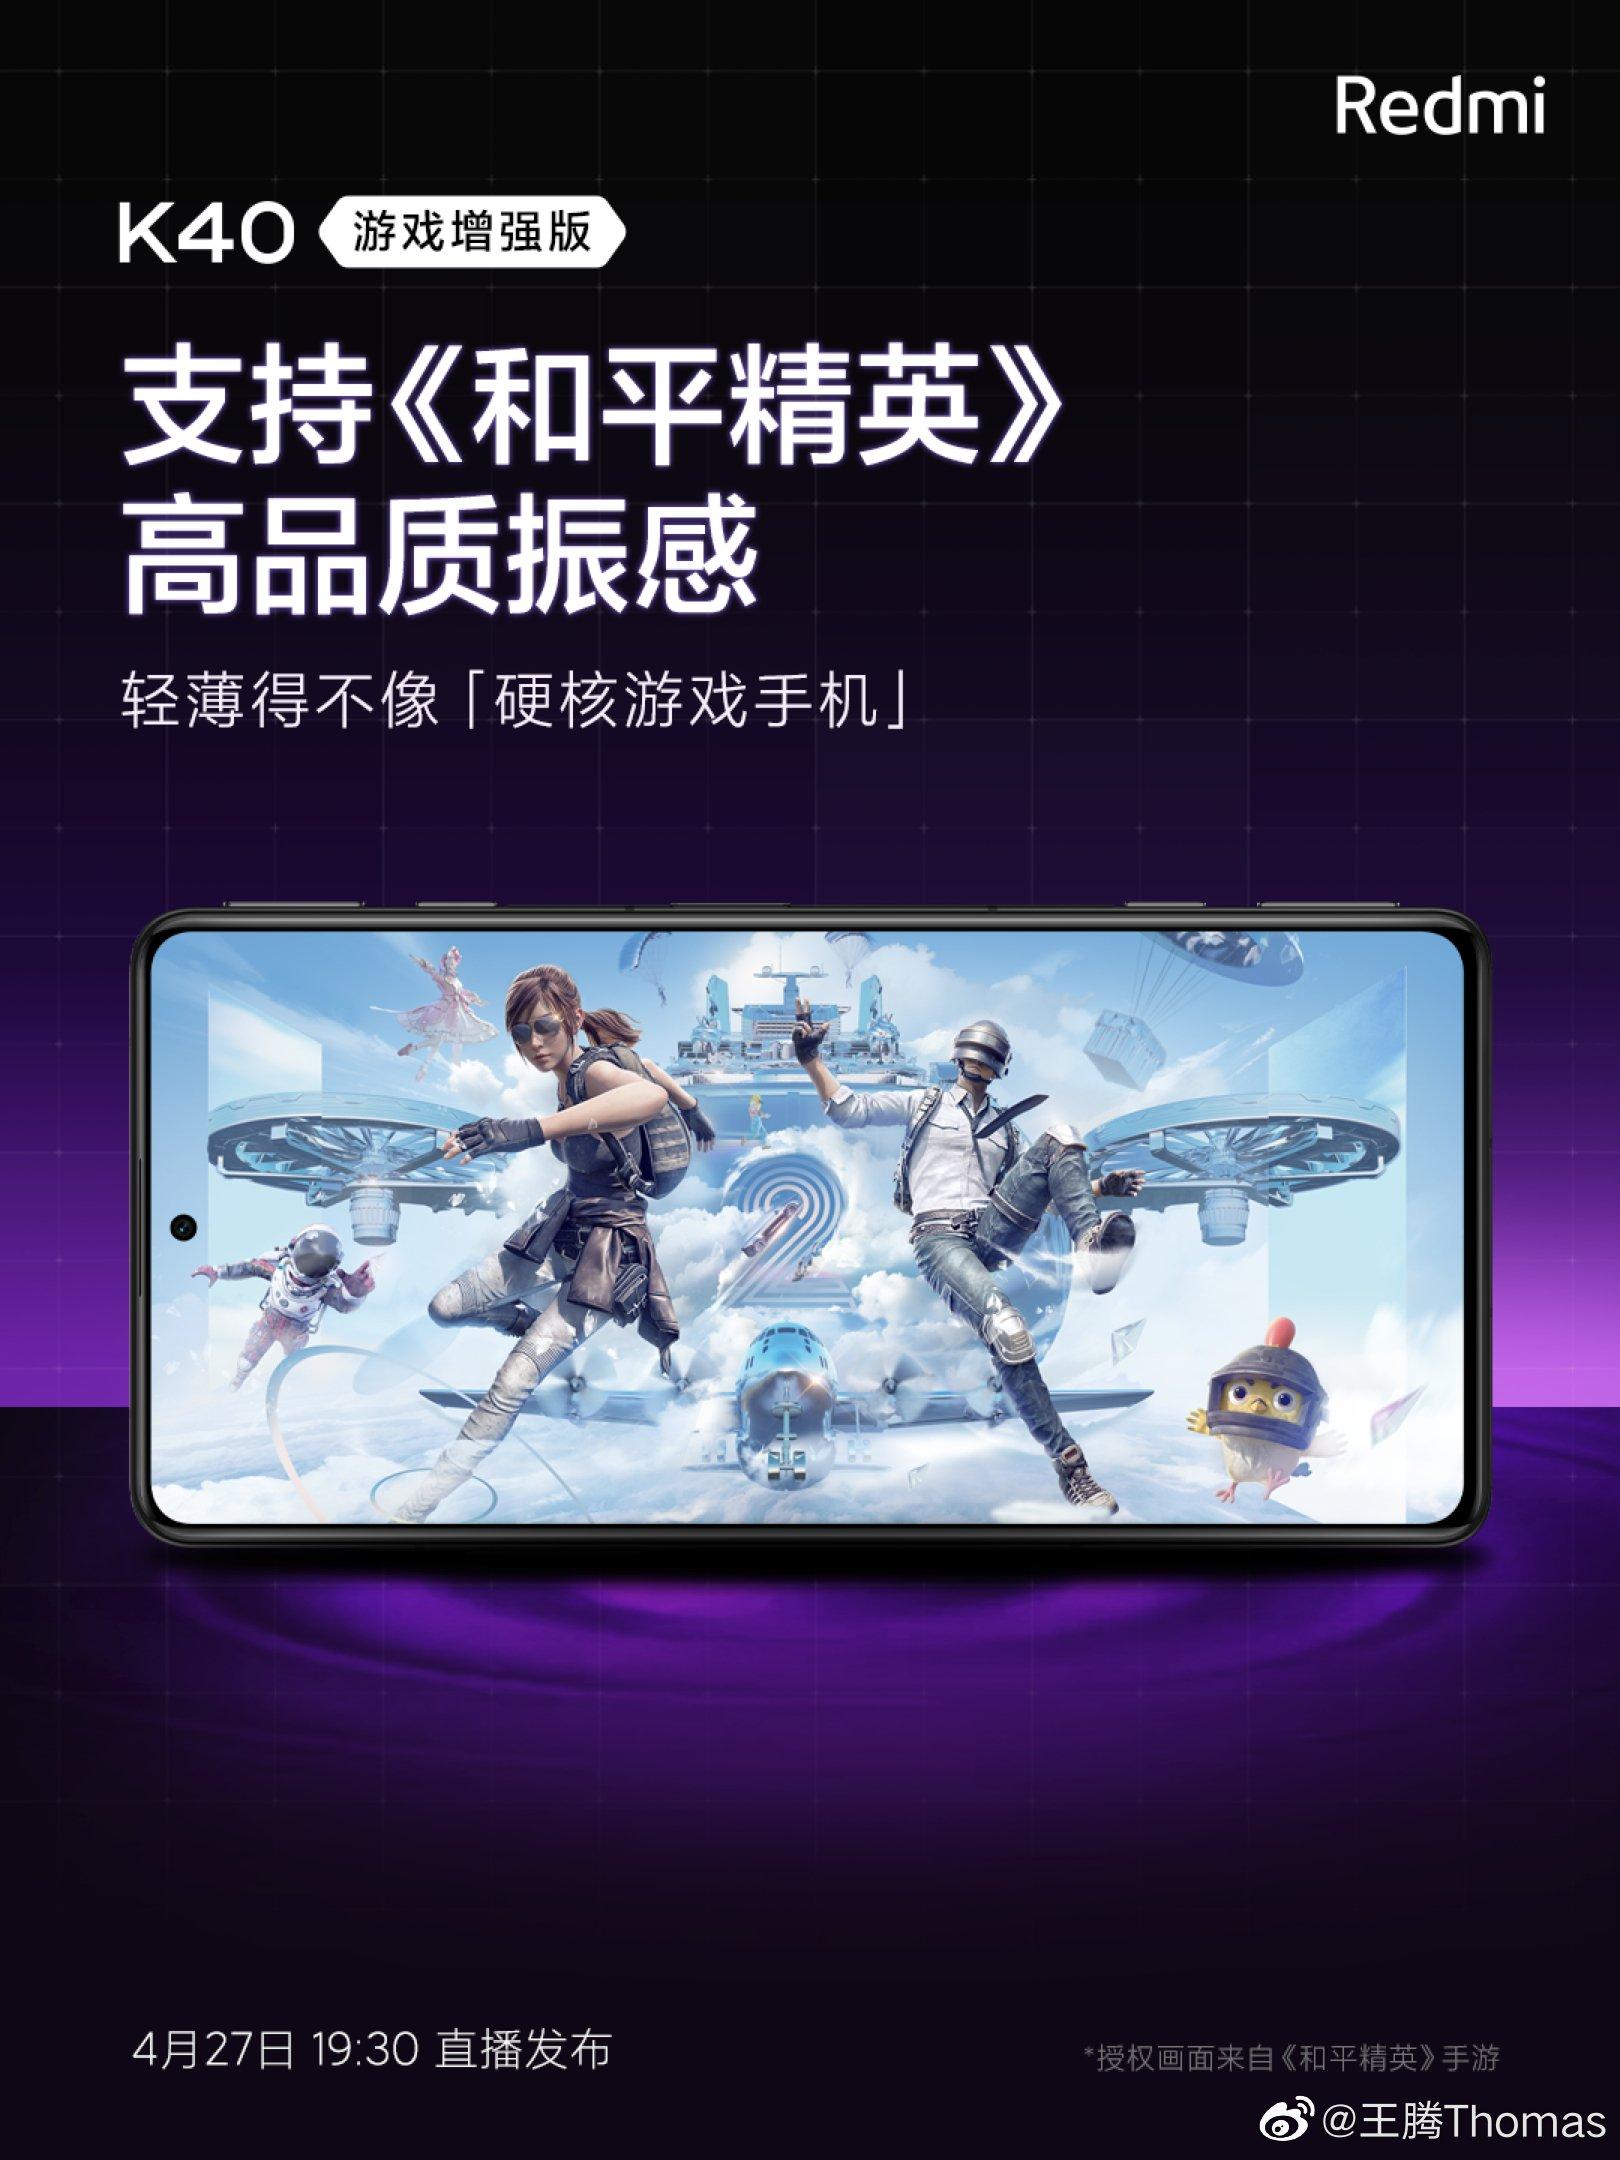 Redmi K40 Gaming Edition Display